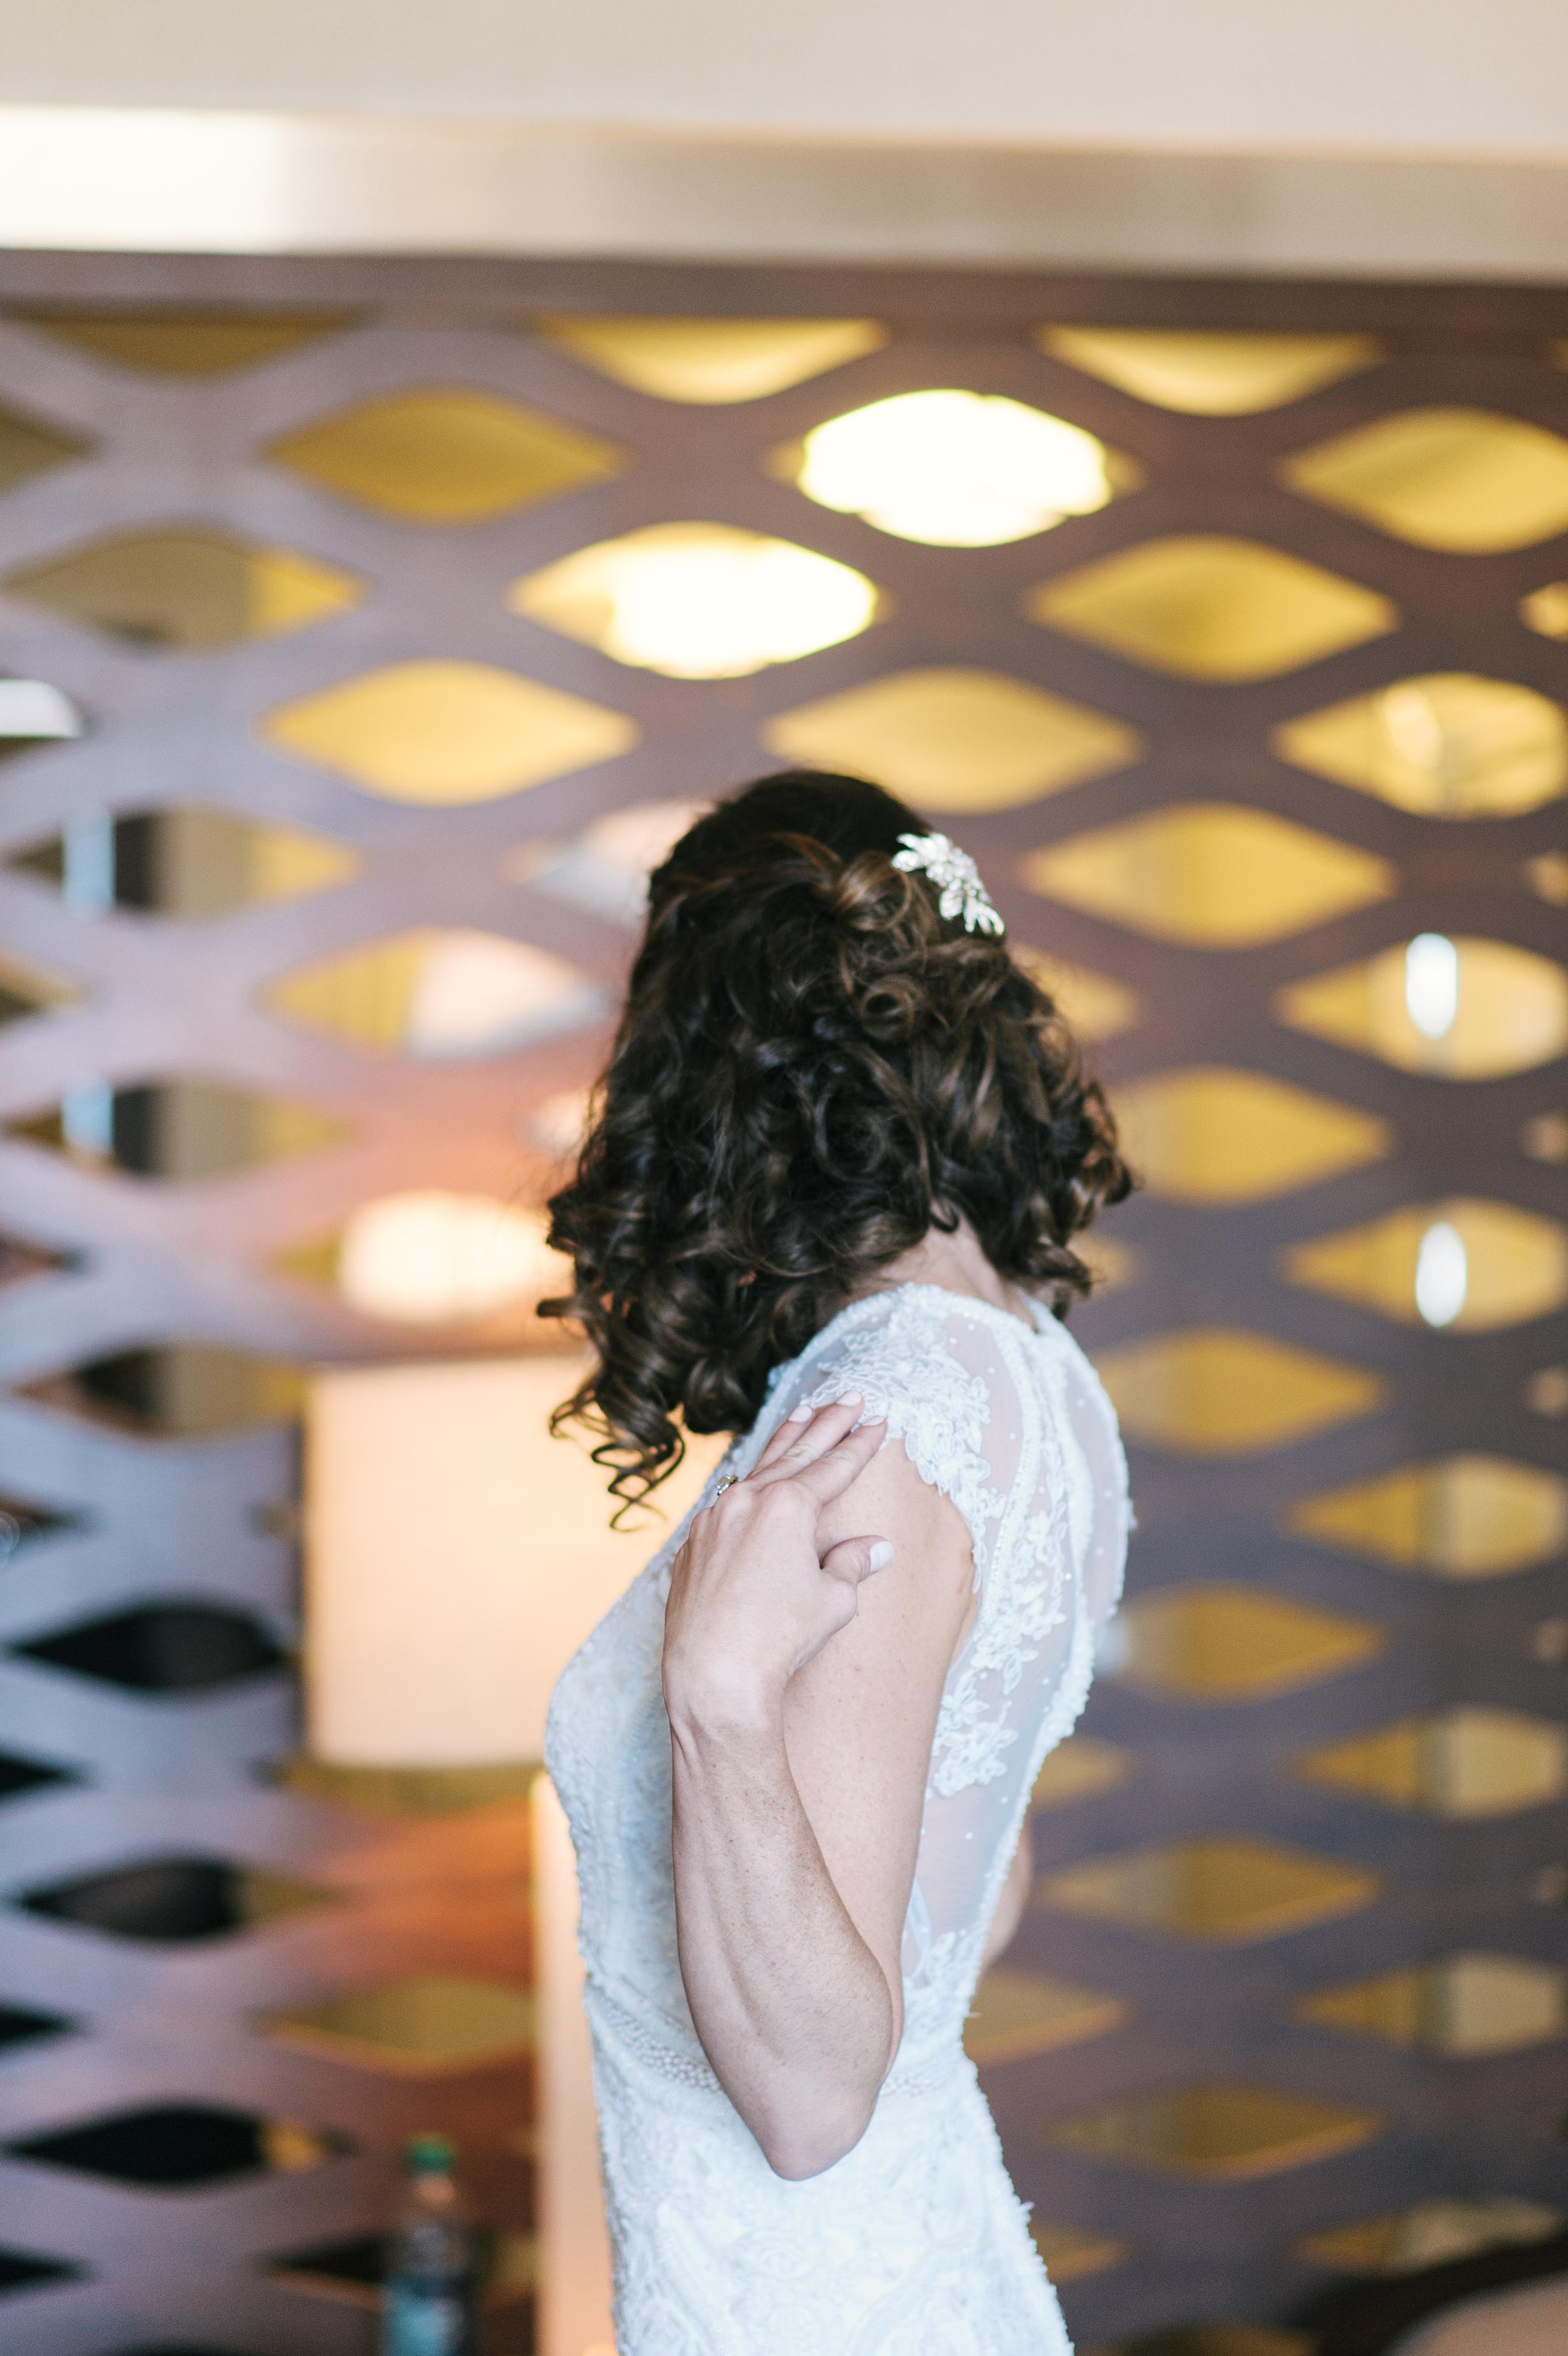 jekyll-island-wedding-cocktails-and-details-savannah-georgia-wedding-photographer-jekyll-island-wedding-photographer-the-westin-jekyll-island-wedding-photographer-georgia-island-wedding-photographer